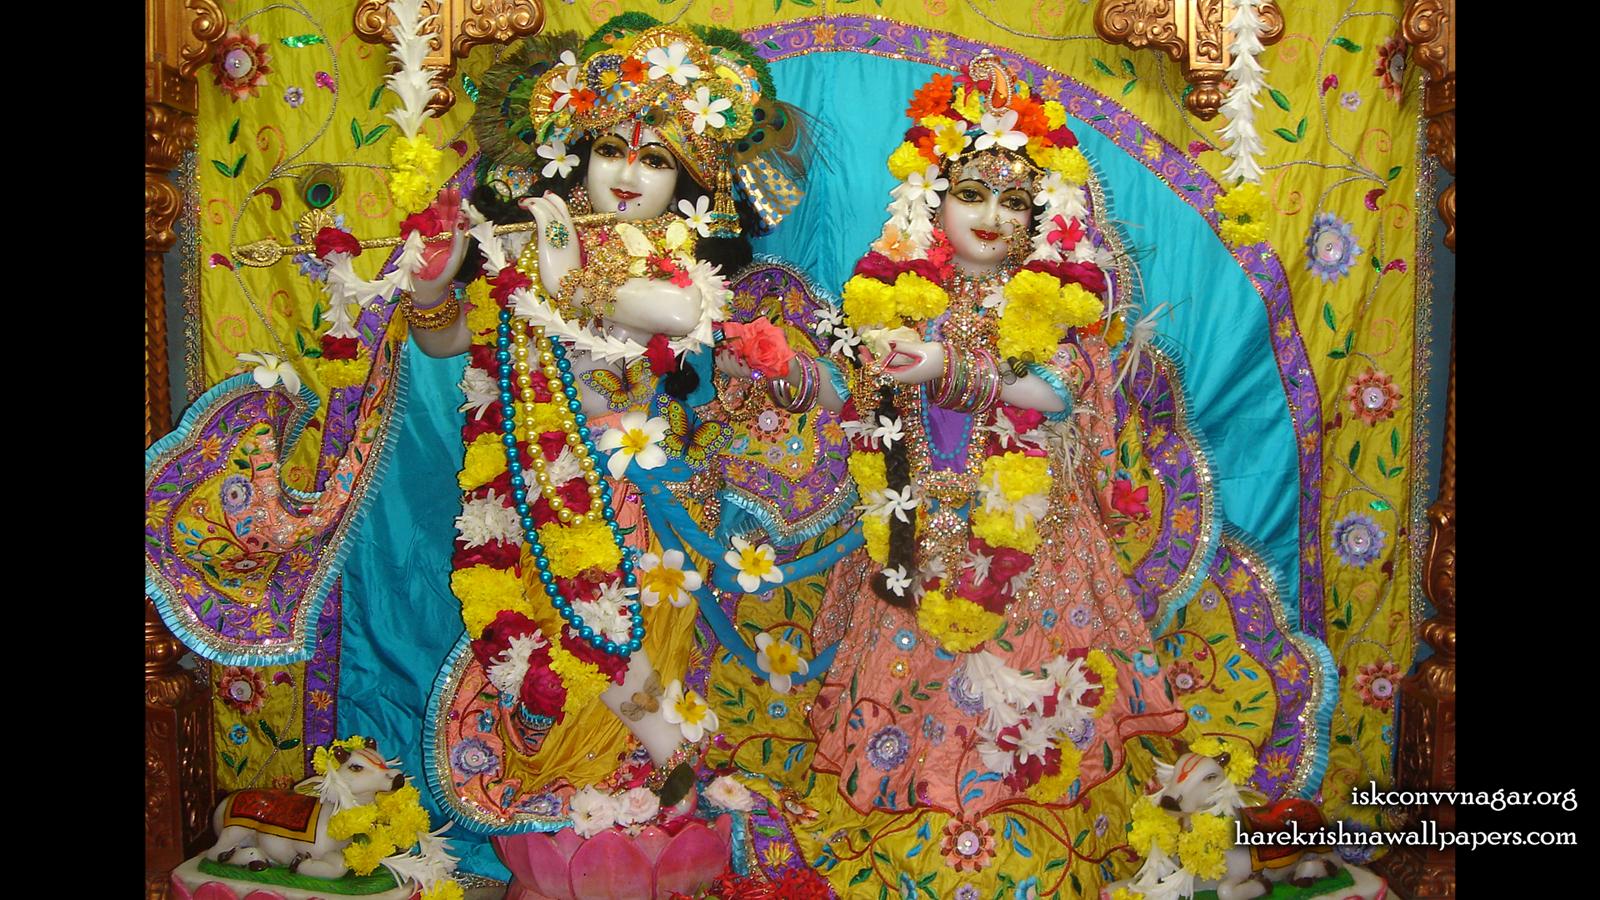 Sri Sri Radha Giridhari Wallpaper (033) Size 1600x900 Download